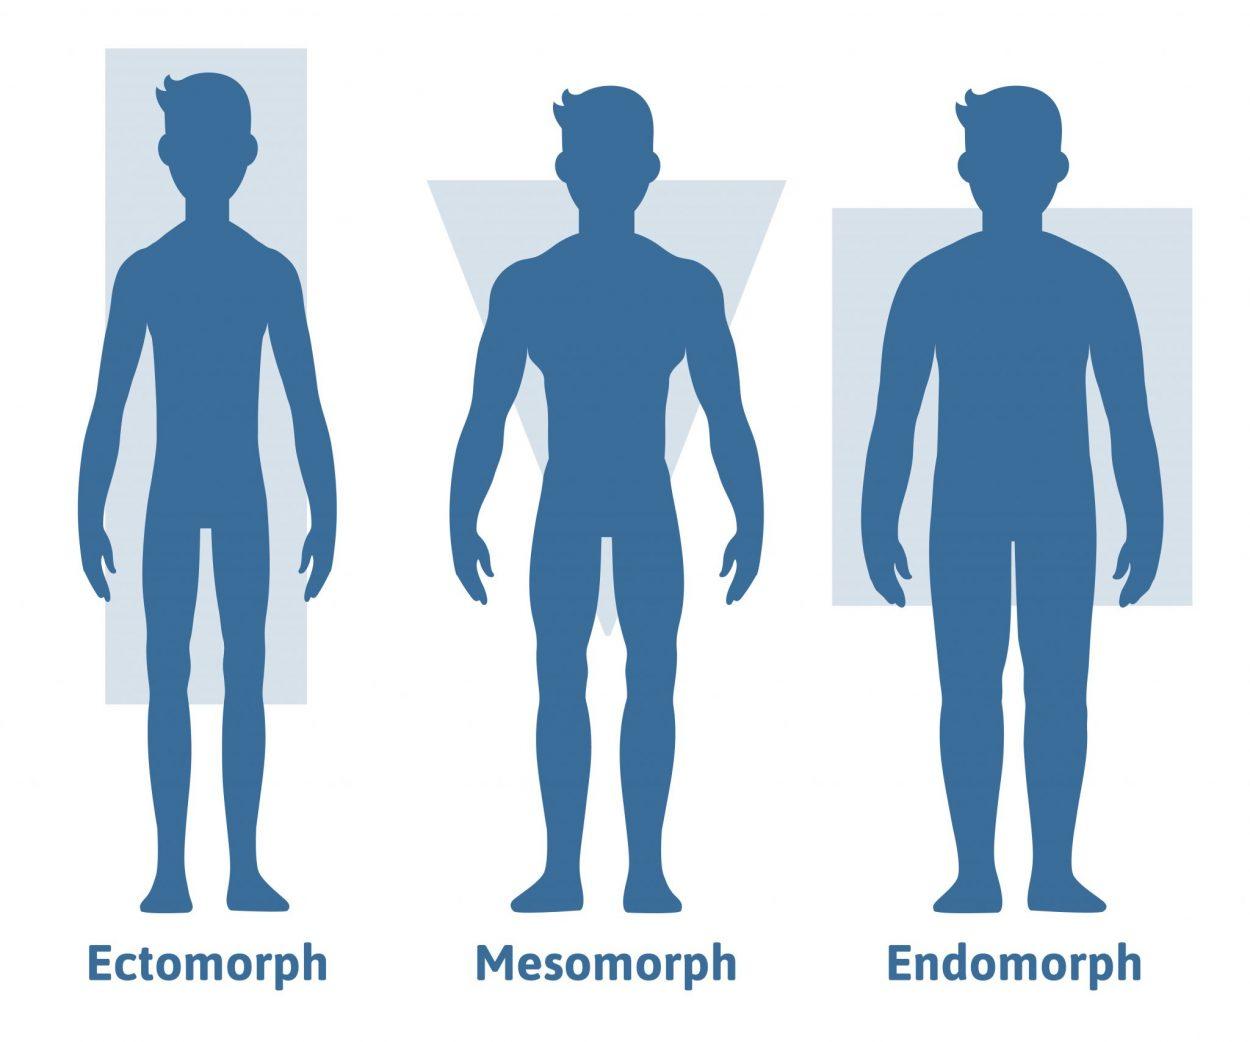 What Body Type am I - Mesomorph, Endomorph or Ectomorph?